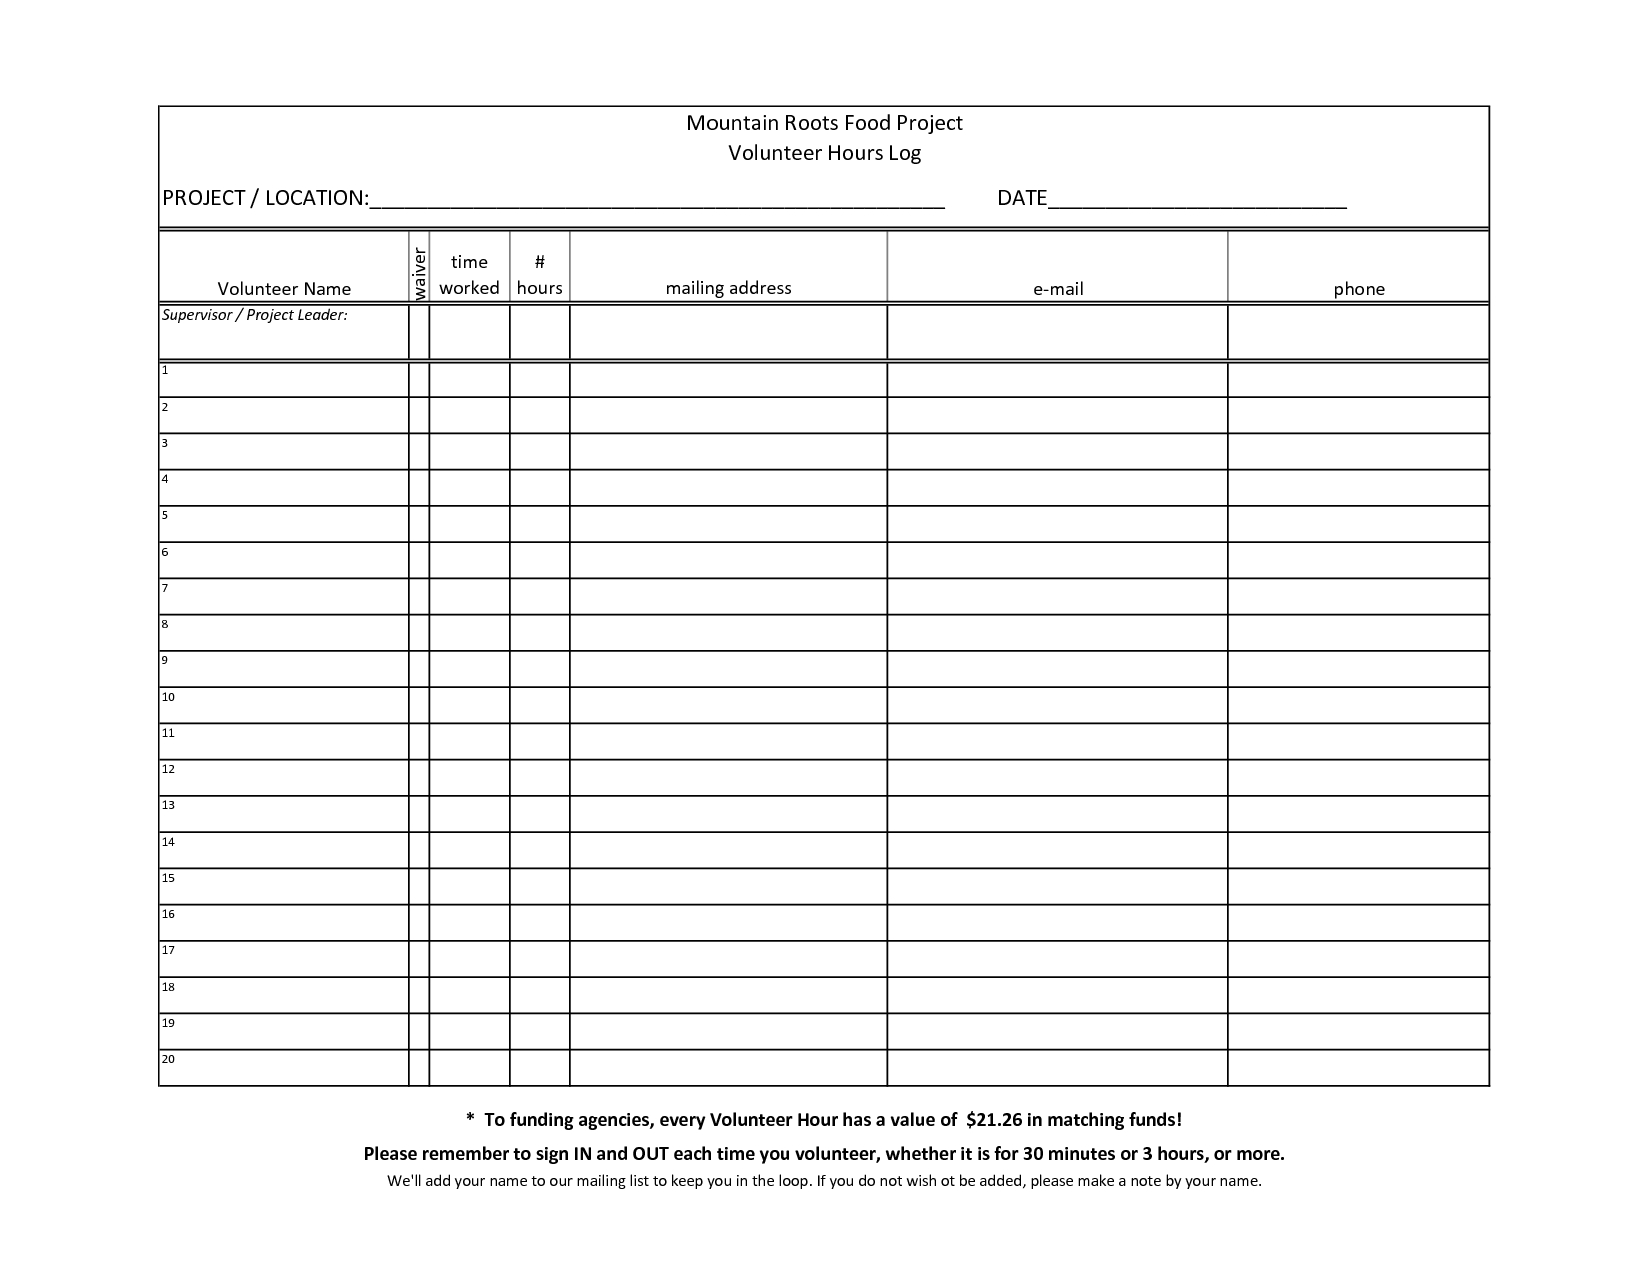 Volunteerhourslogsheettemplate  Fara Therapy Tools  Community Intended For Volunteer Report Template